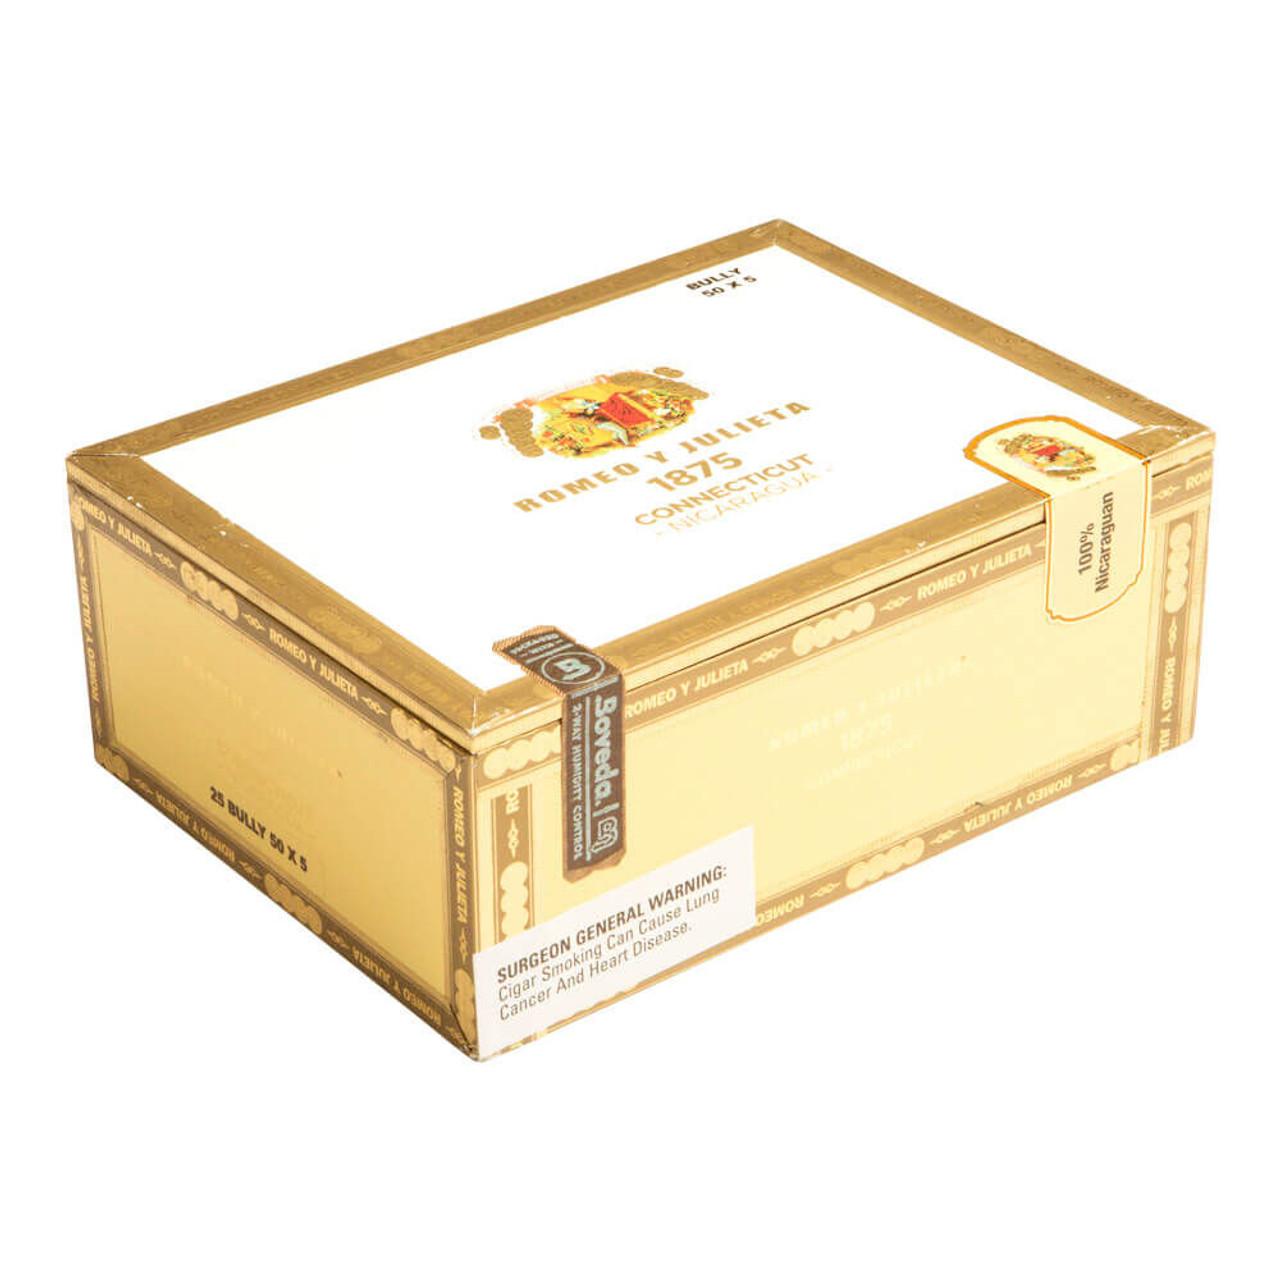 Romeo y Julieta 1875 Connecticut Nicaragua Bully Cigars - 5 x 50 (Box of 25)